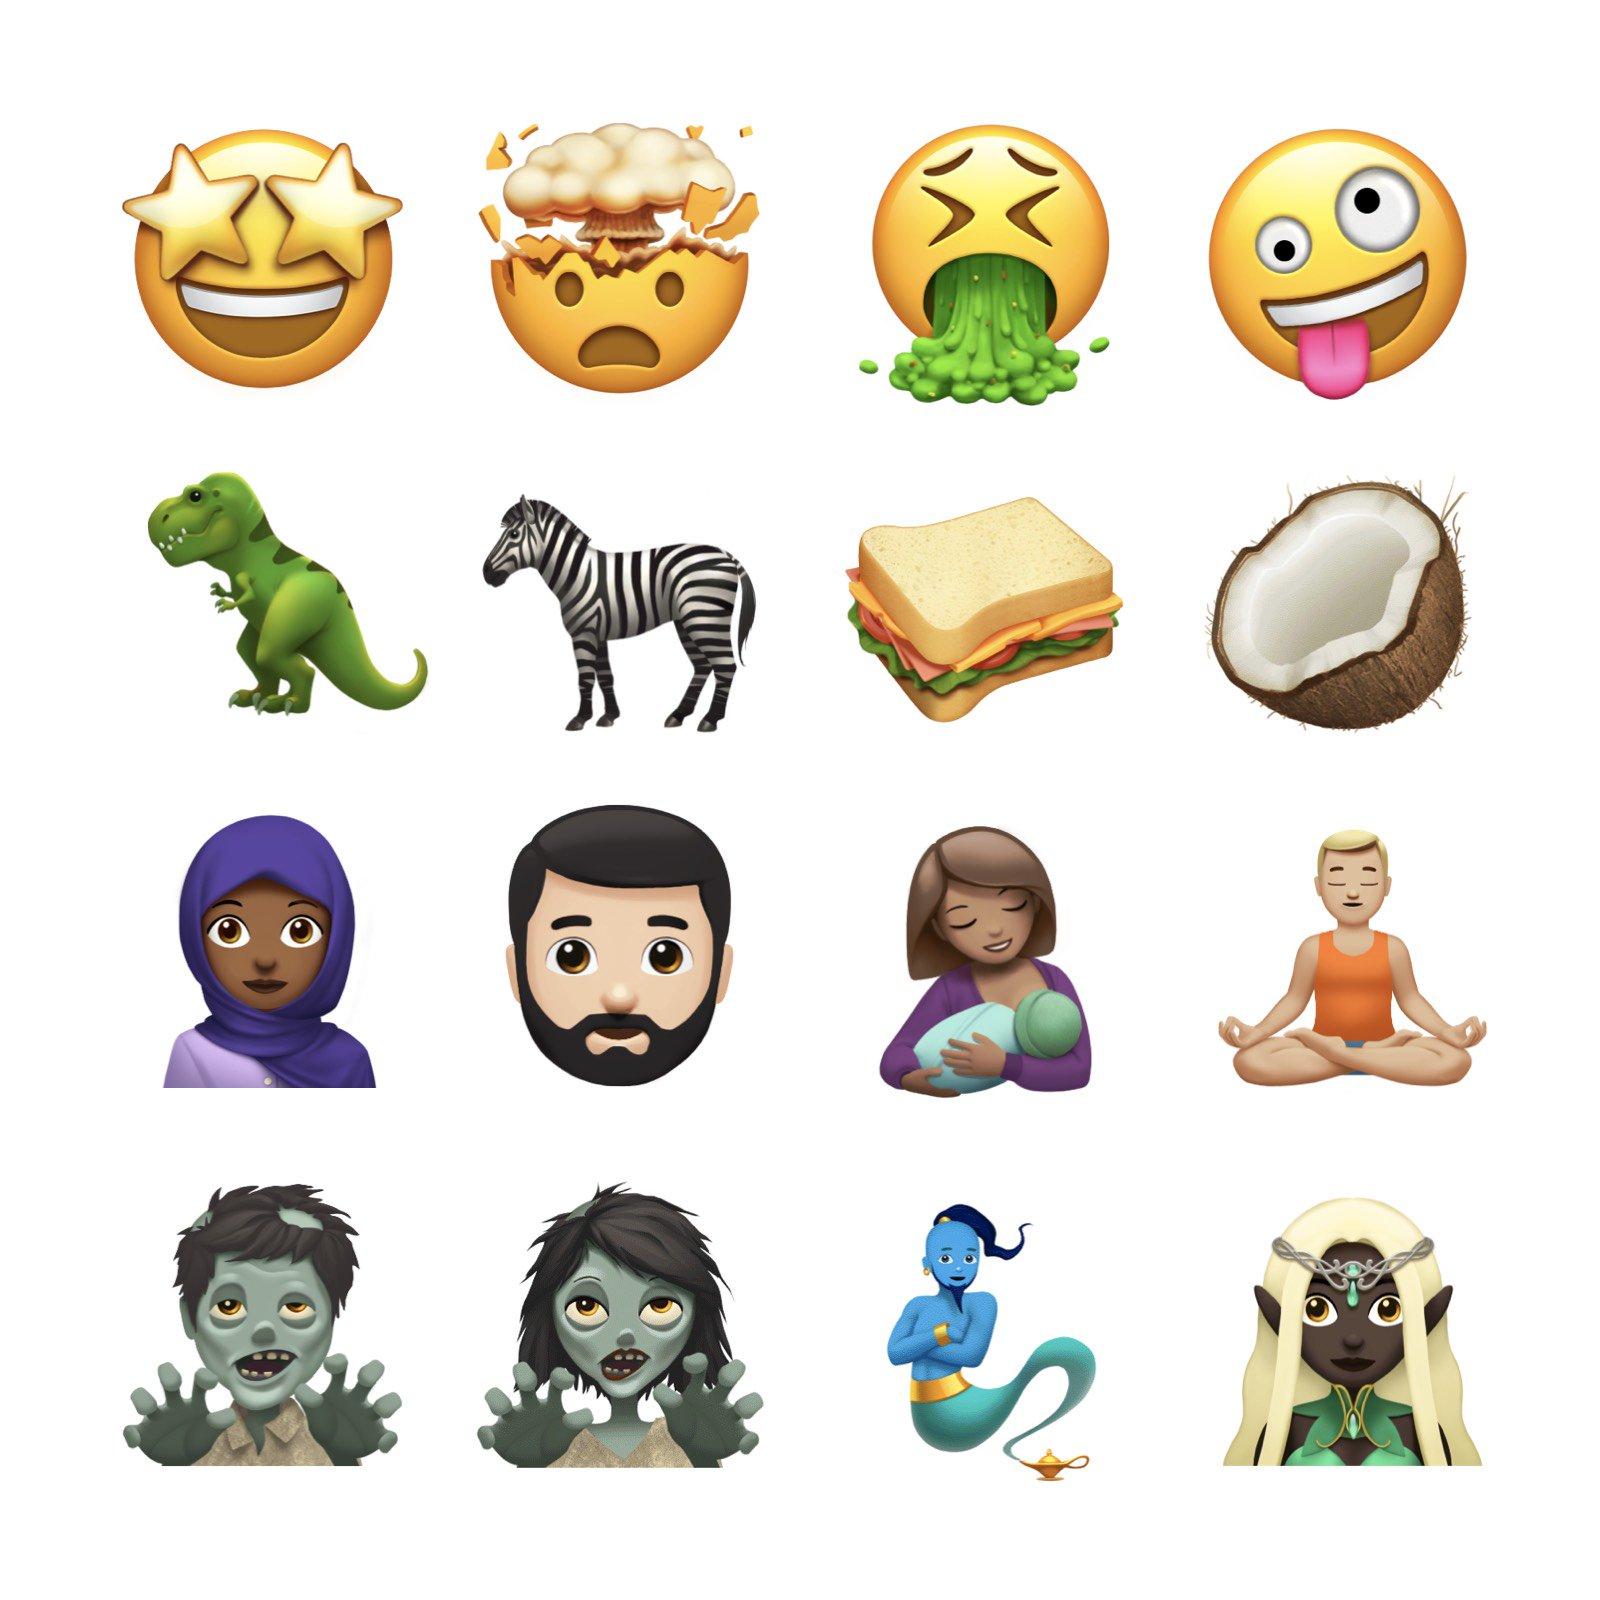 ios-new-emojis-2017-emojipedia-emoji-5-1-1